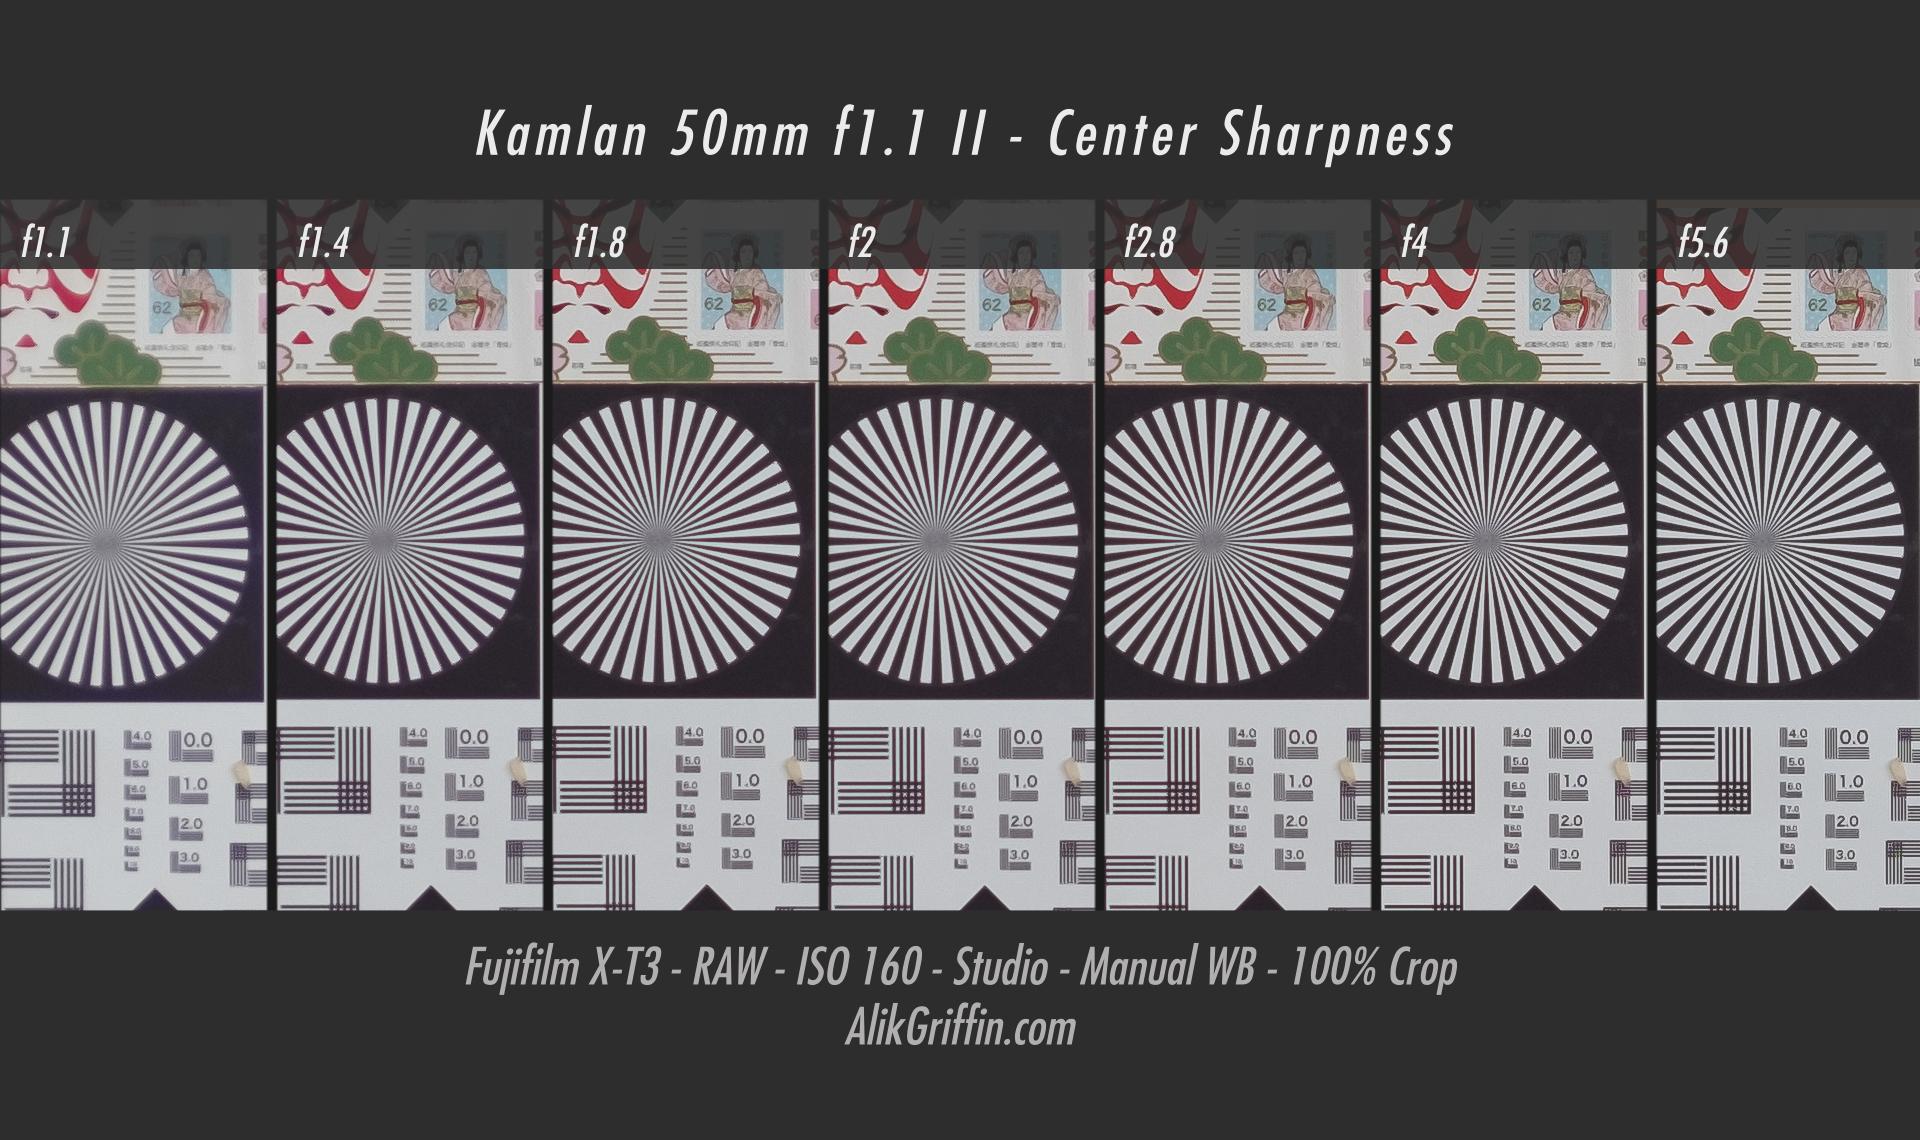 Kamlan 50mm f1.1 II Center Sharpness Chart